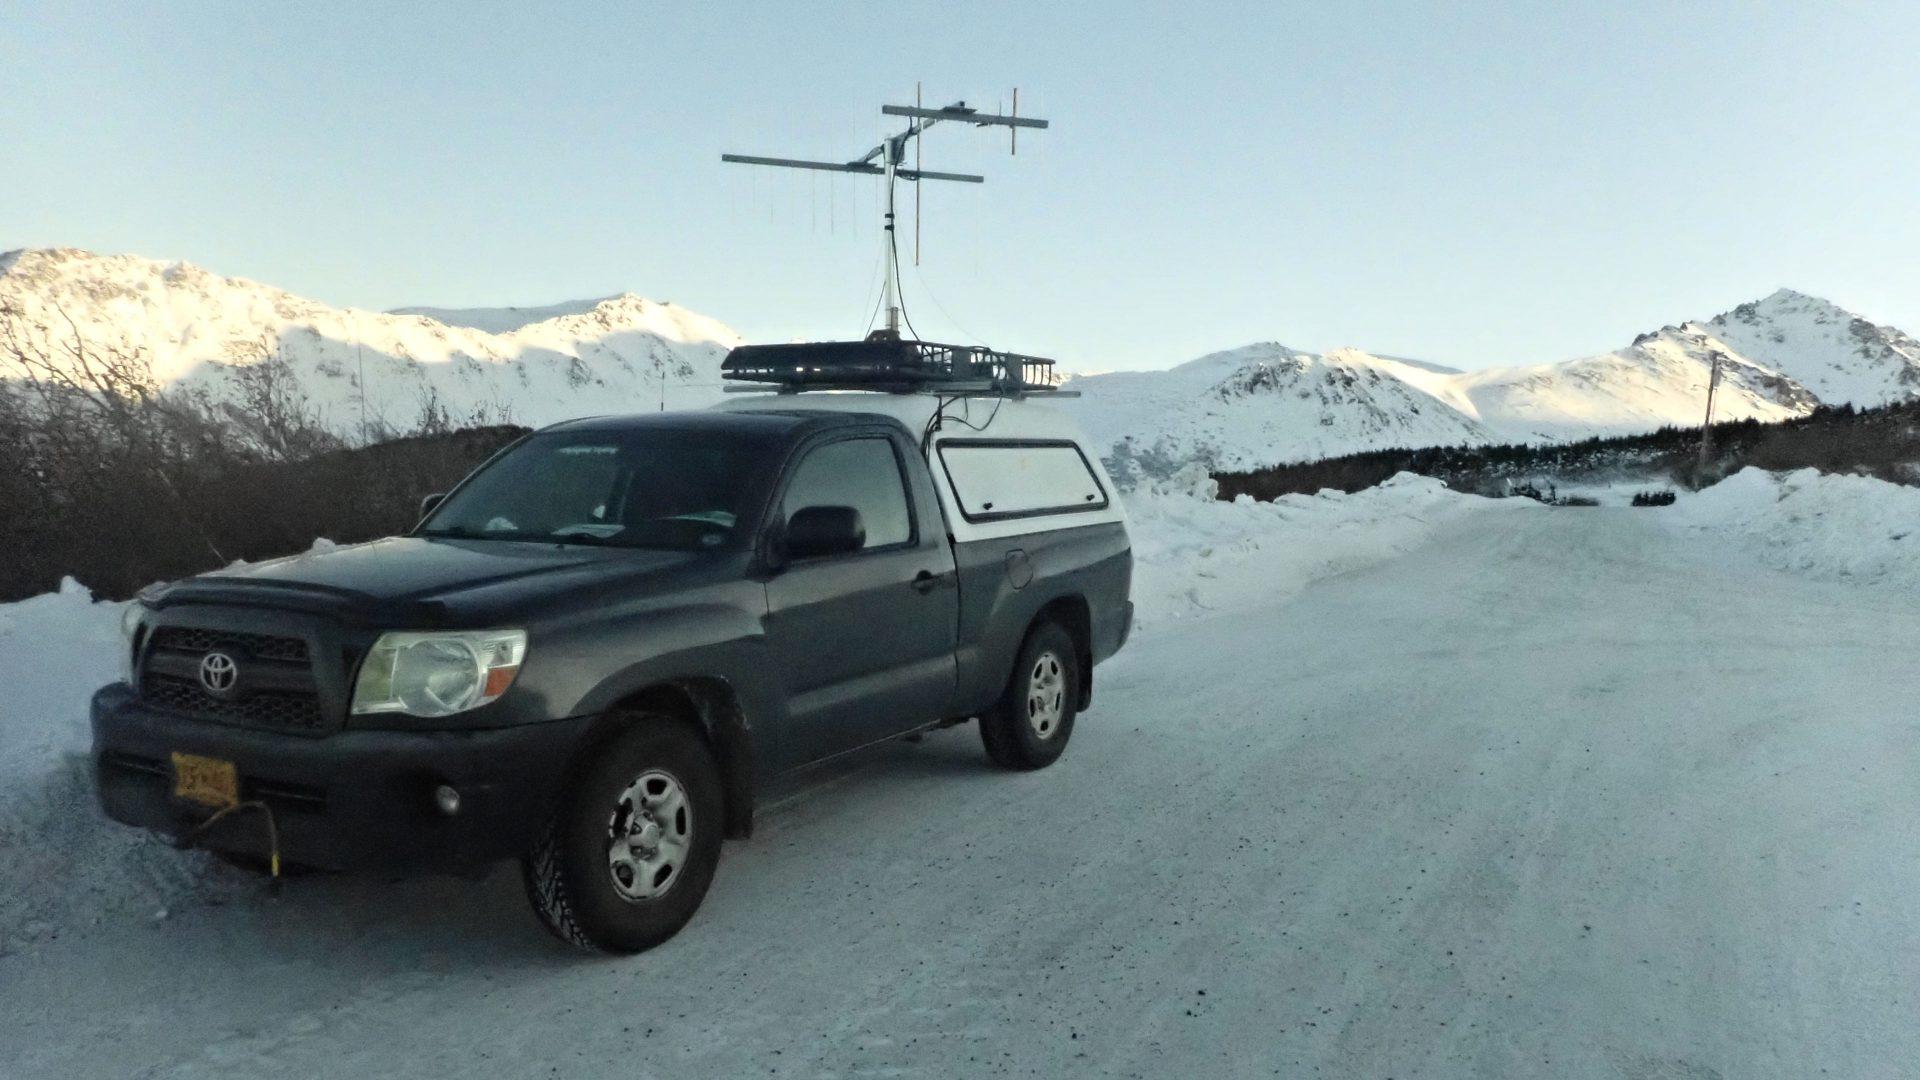 Toyota Tacoma VHF rover on teh roadside in snowy Alaska